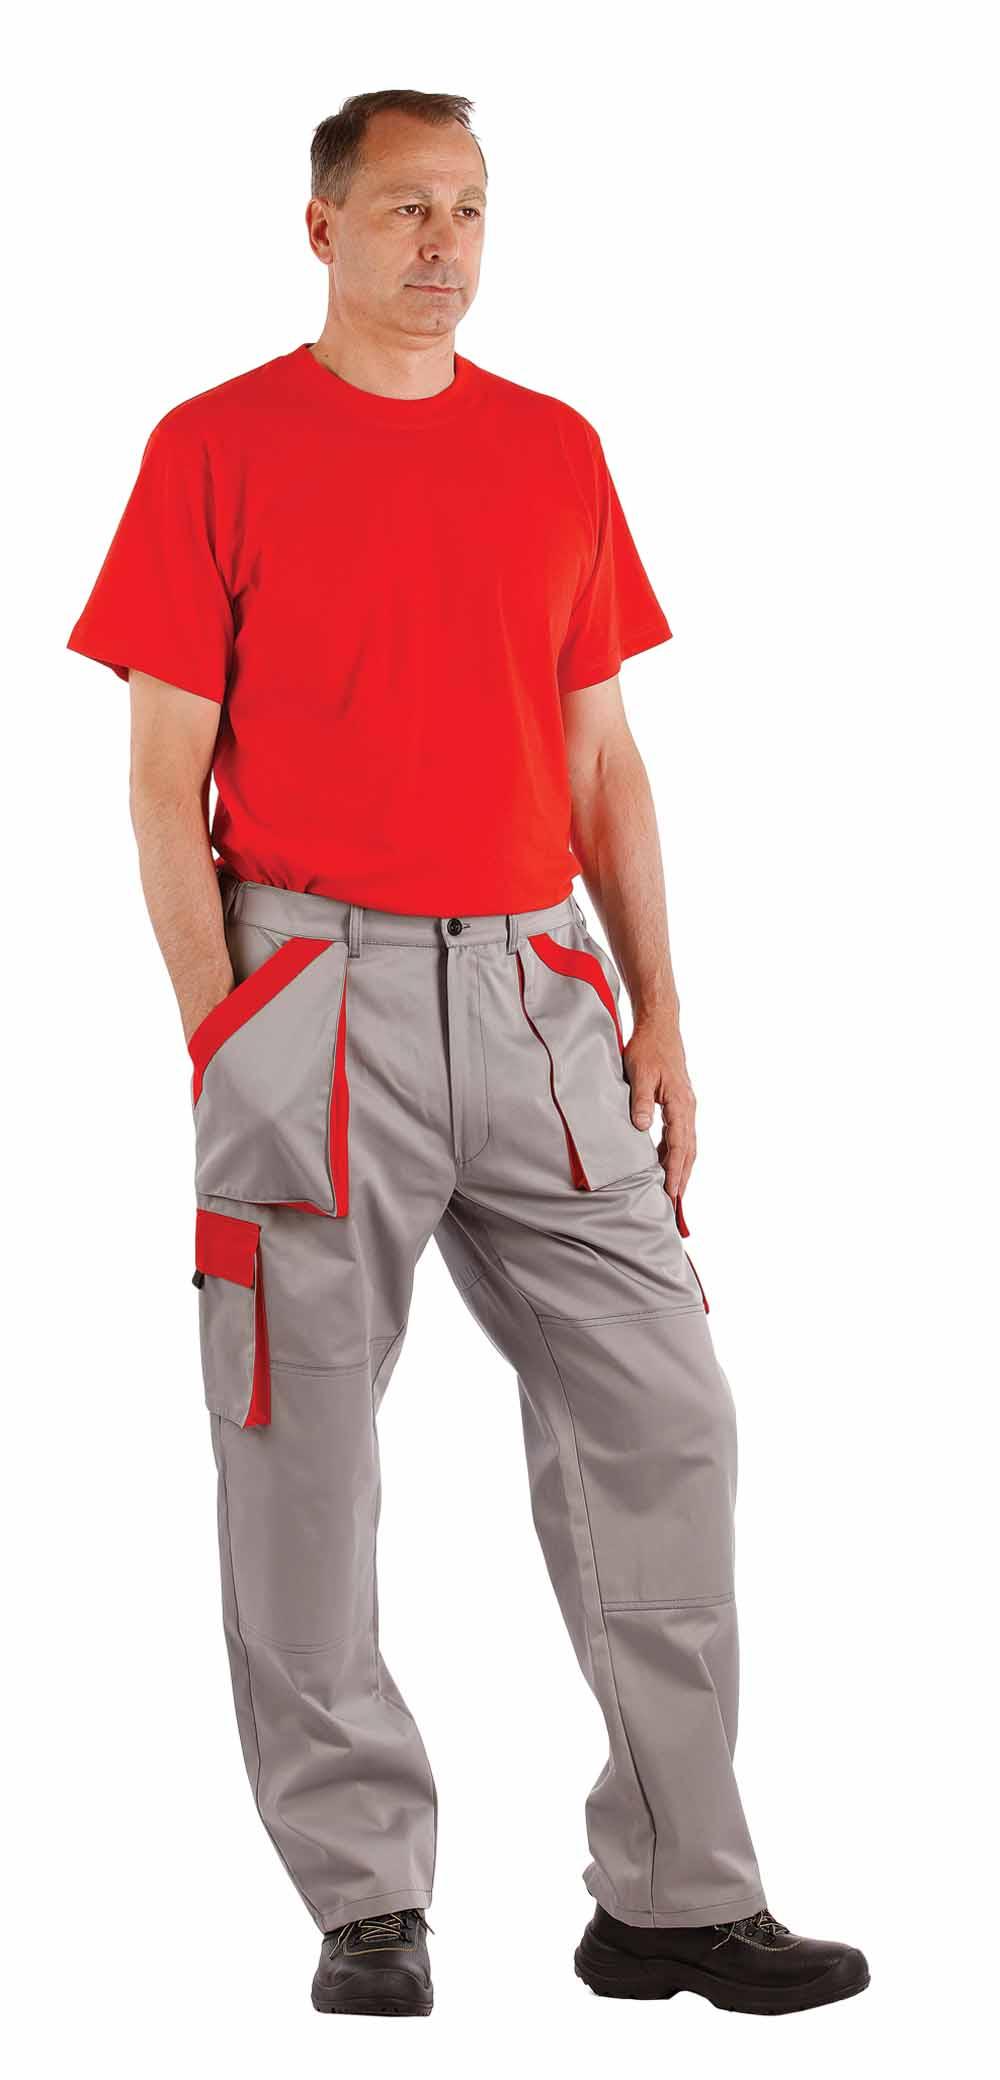 MAX nadrág szürke-piros